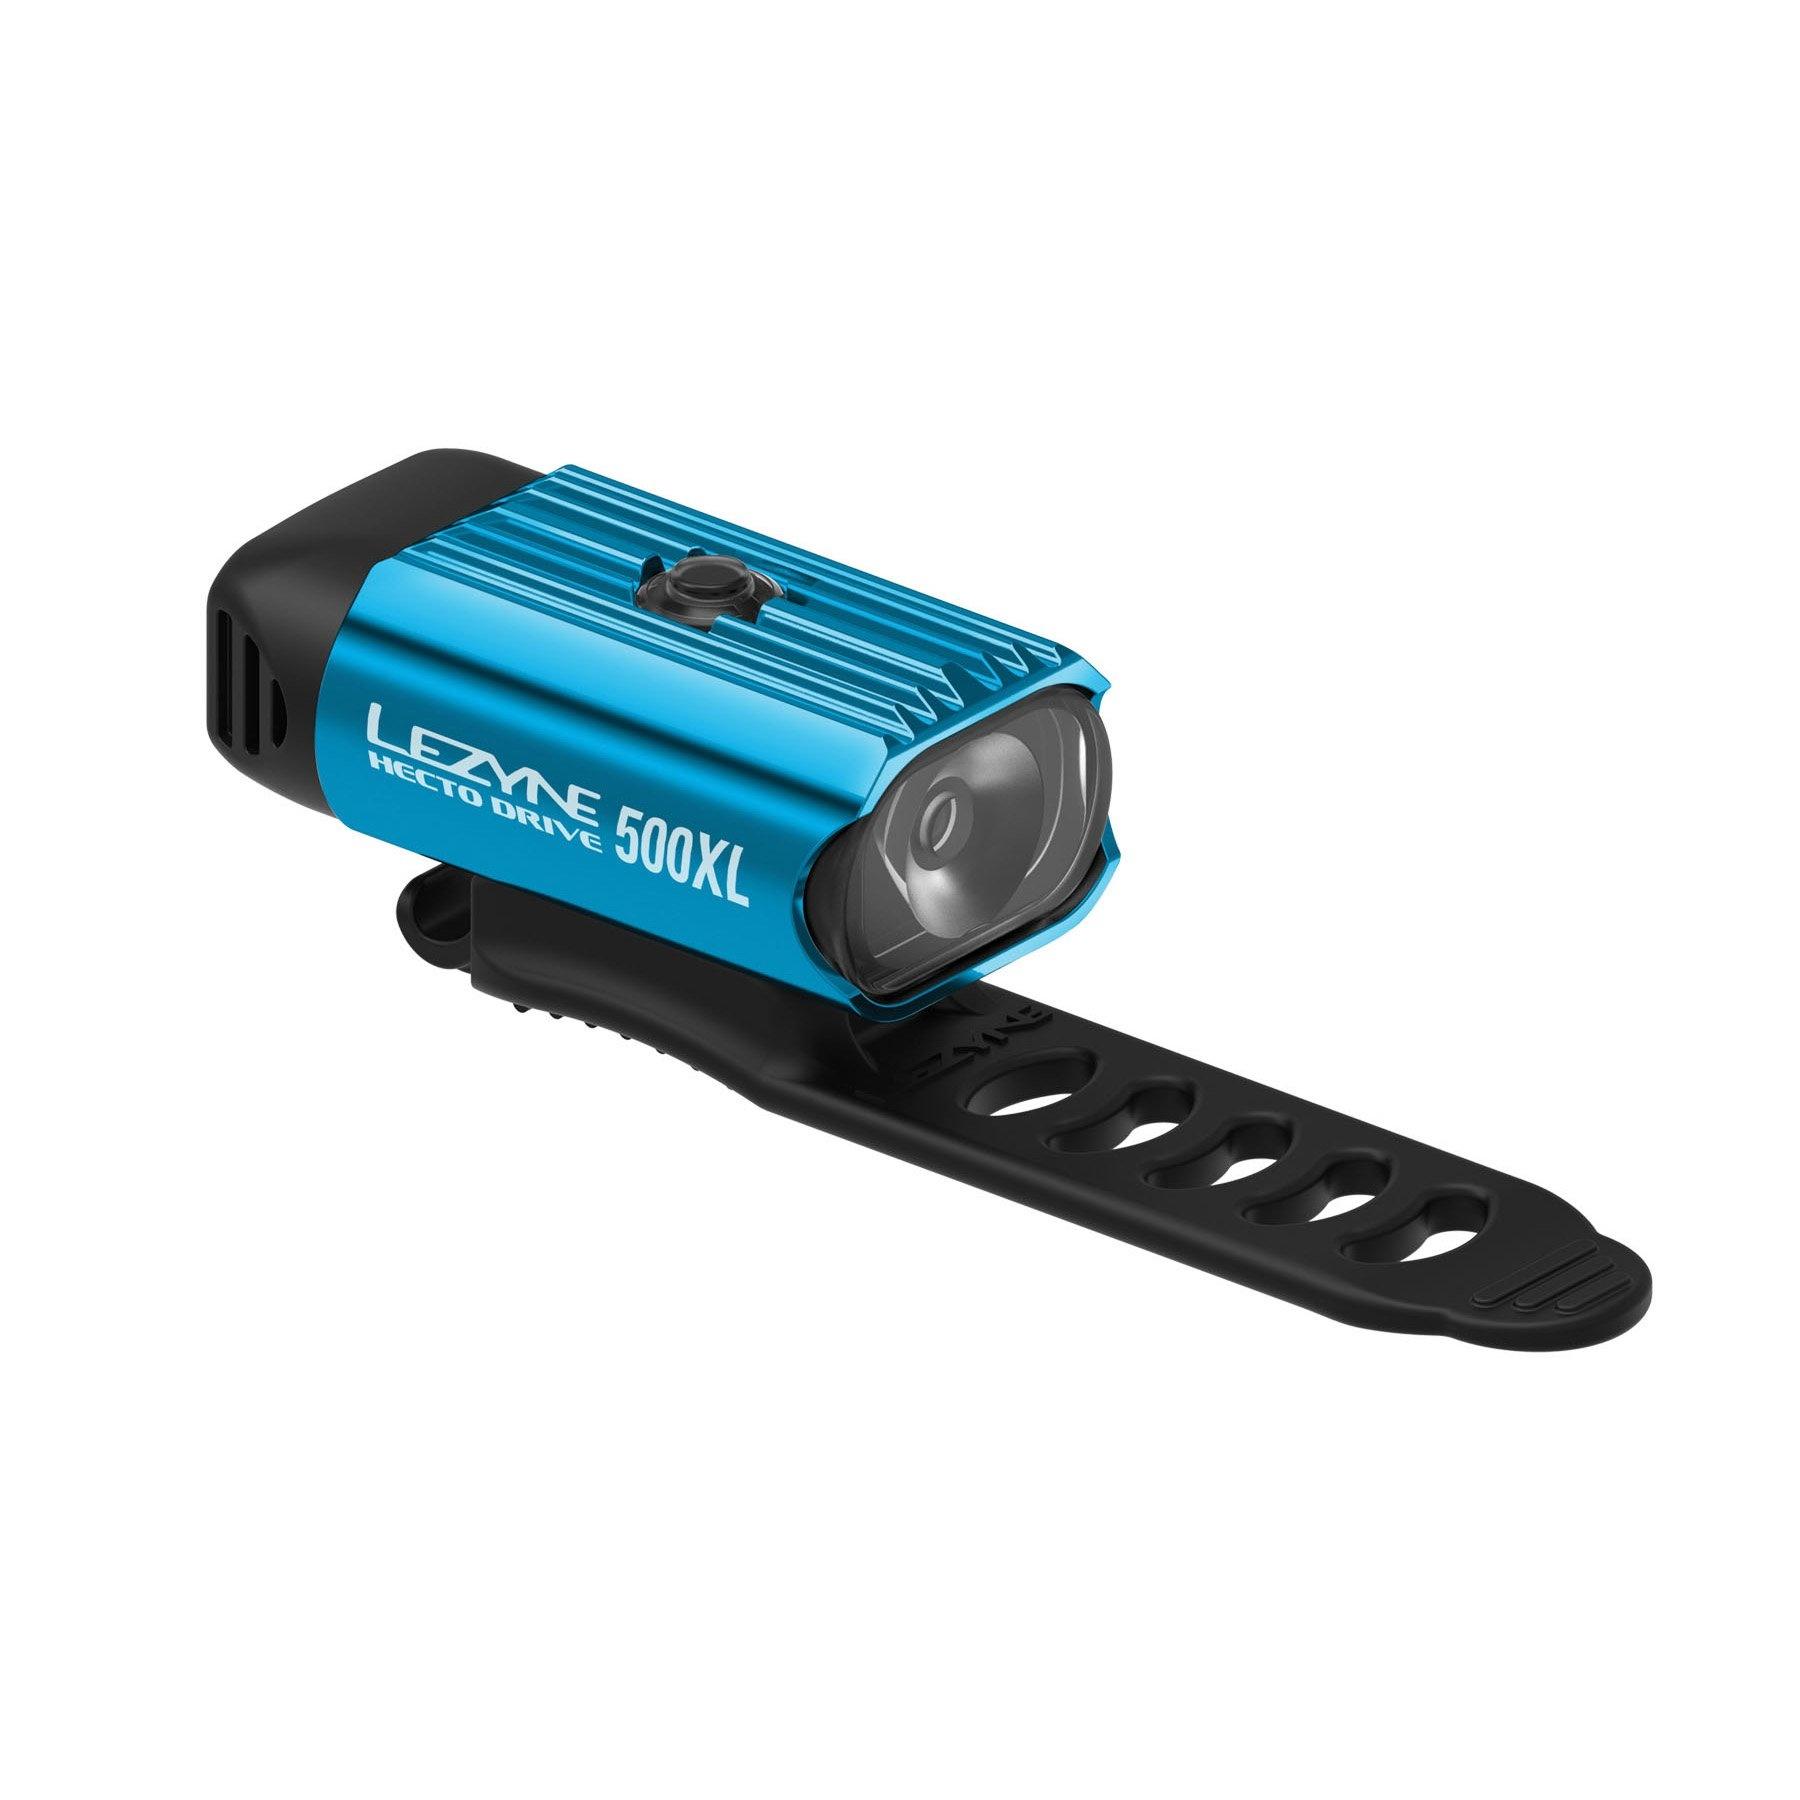 Lezyne Lezyne Hecto Drive 500XL Headlight 2020